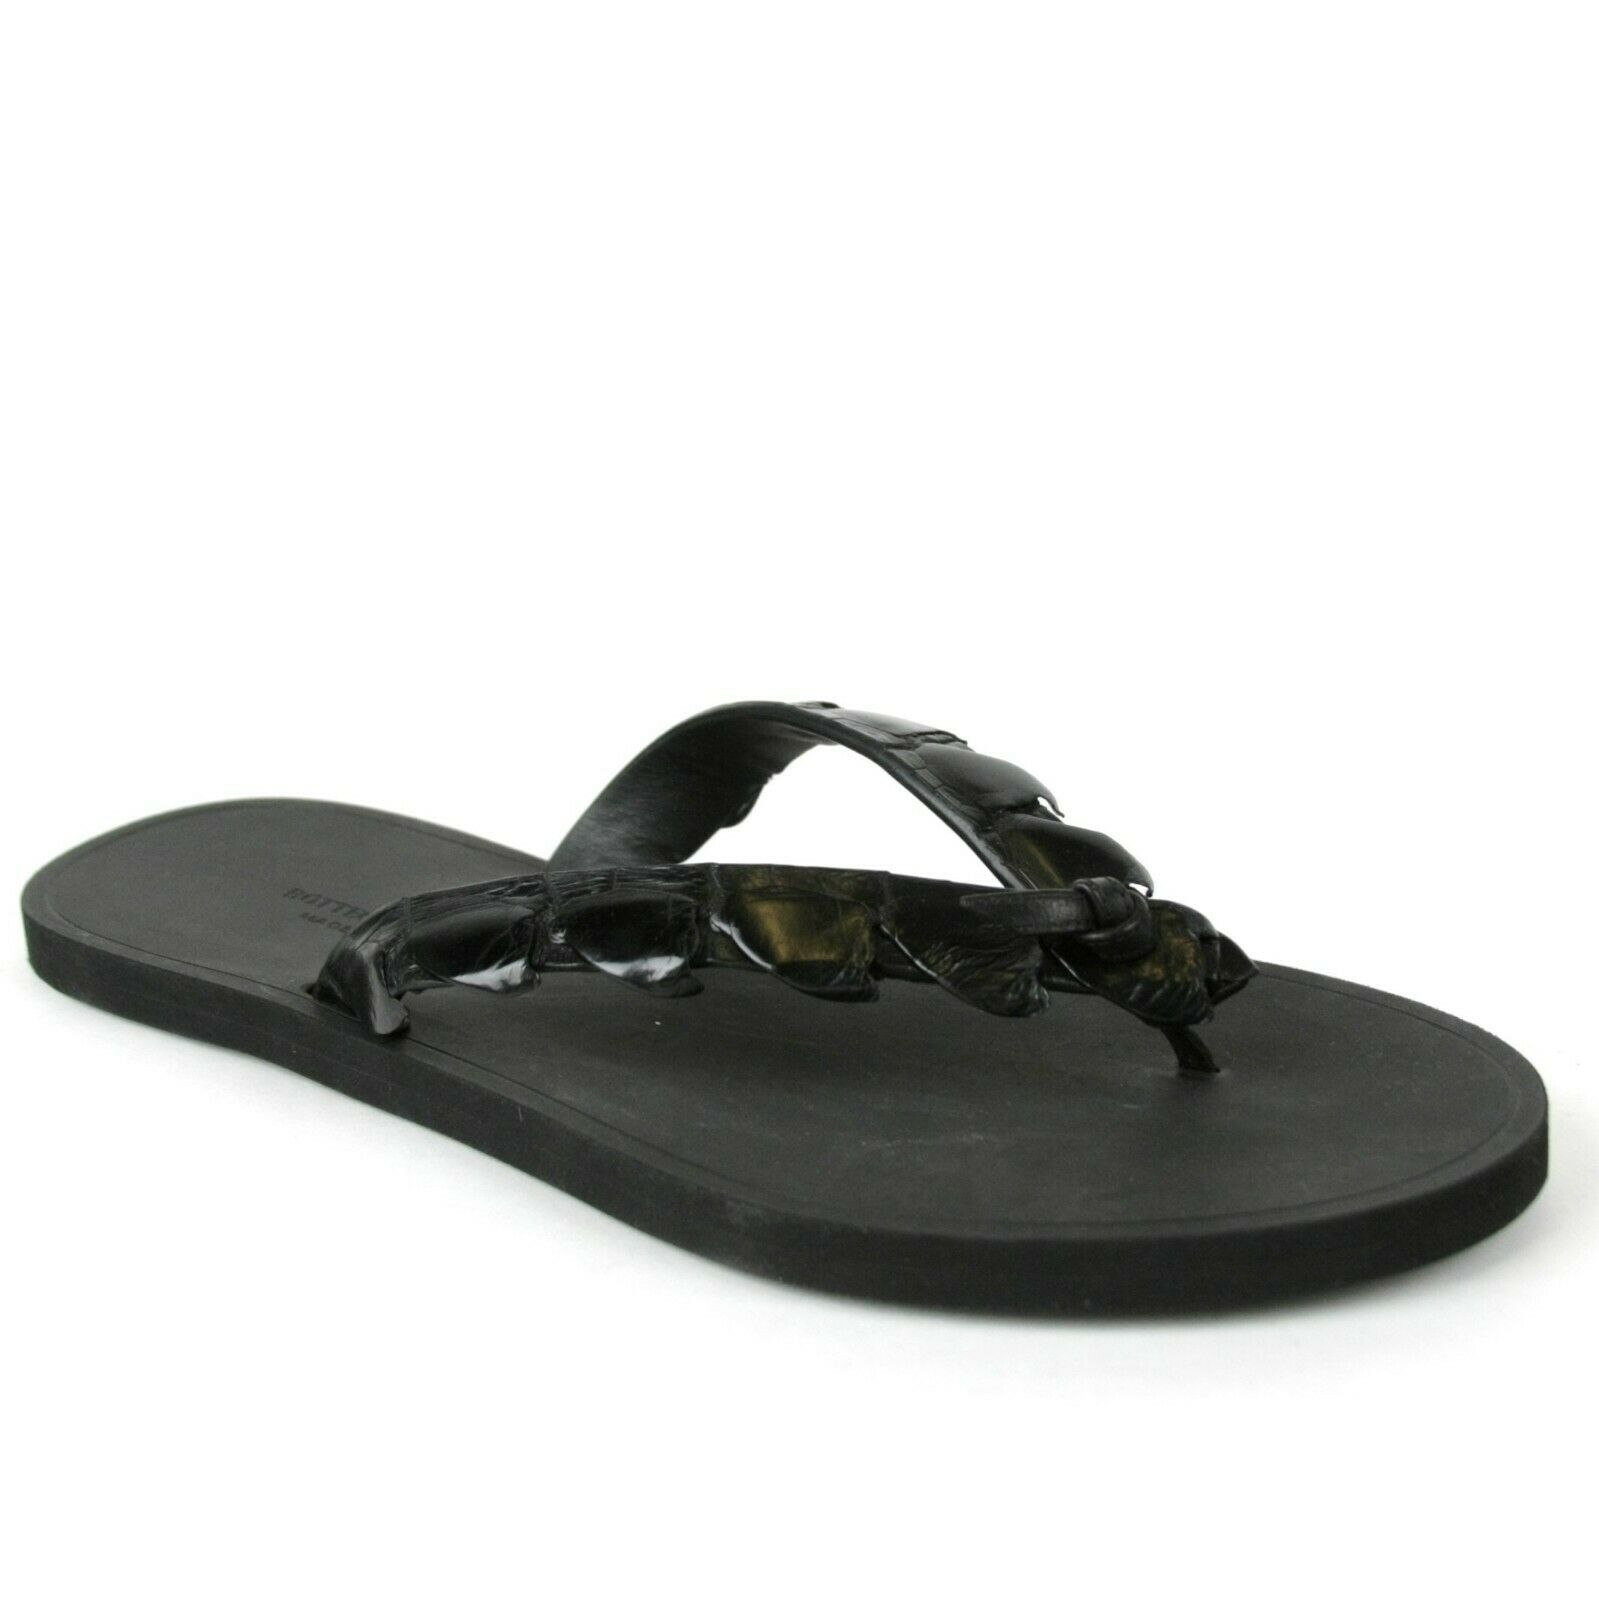 Bottega Veneta Men's Black Crocodile Leather Thong Sandal 298725 1000 | eBay